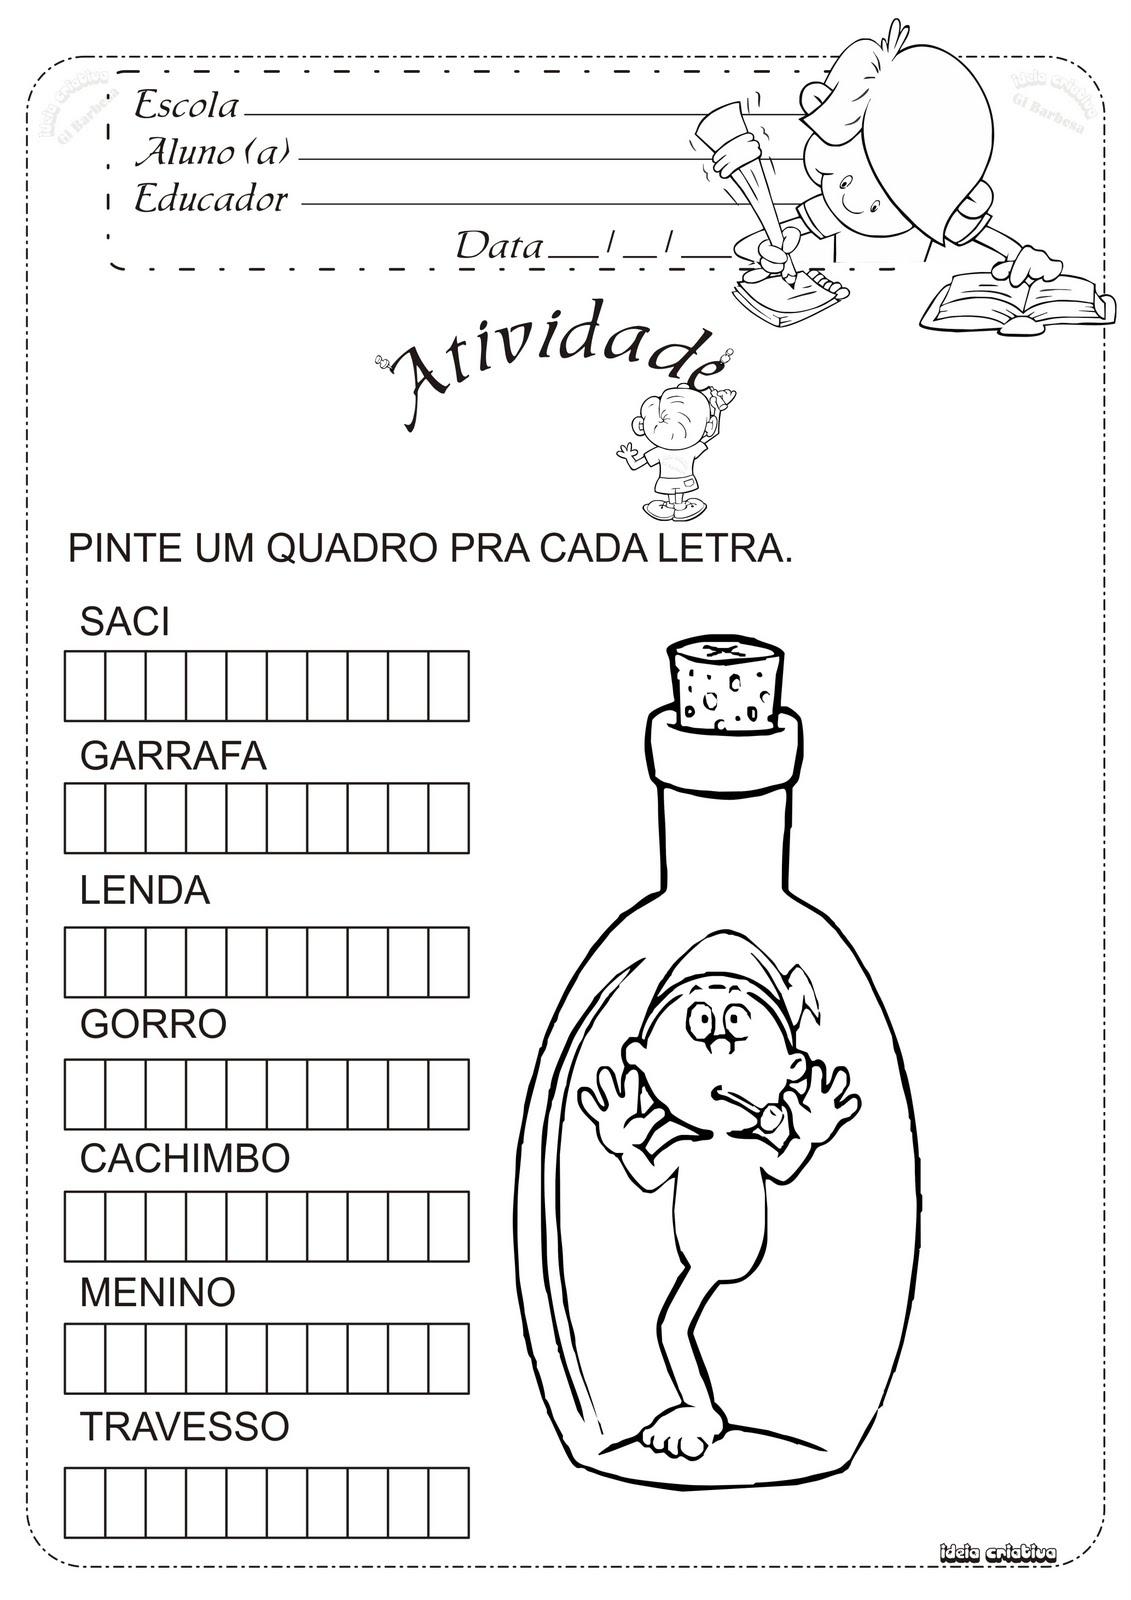 Atividade Folclore Saci na garrafa.